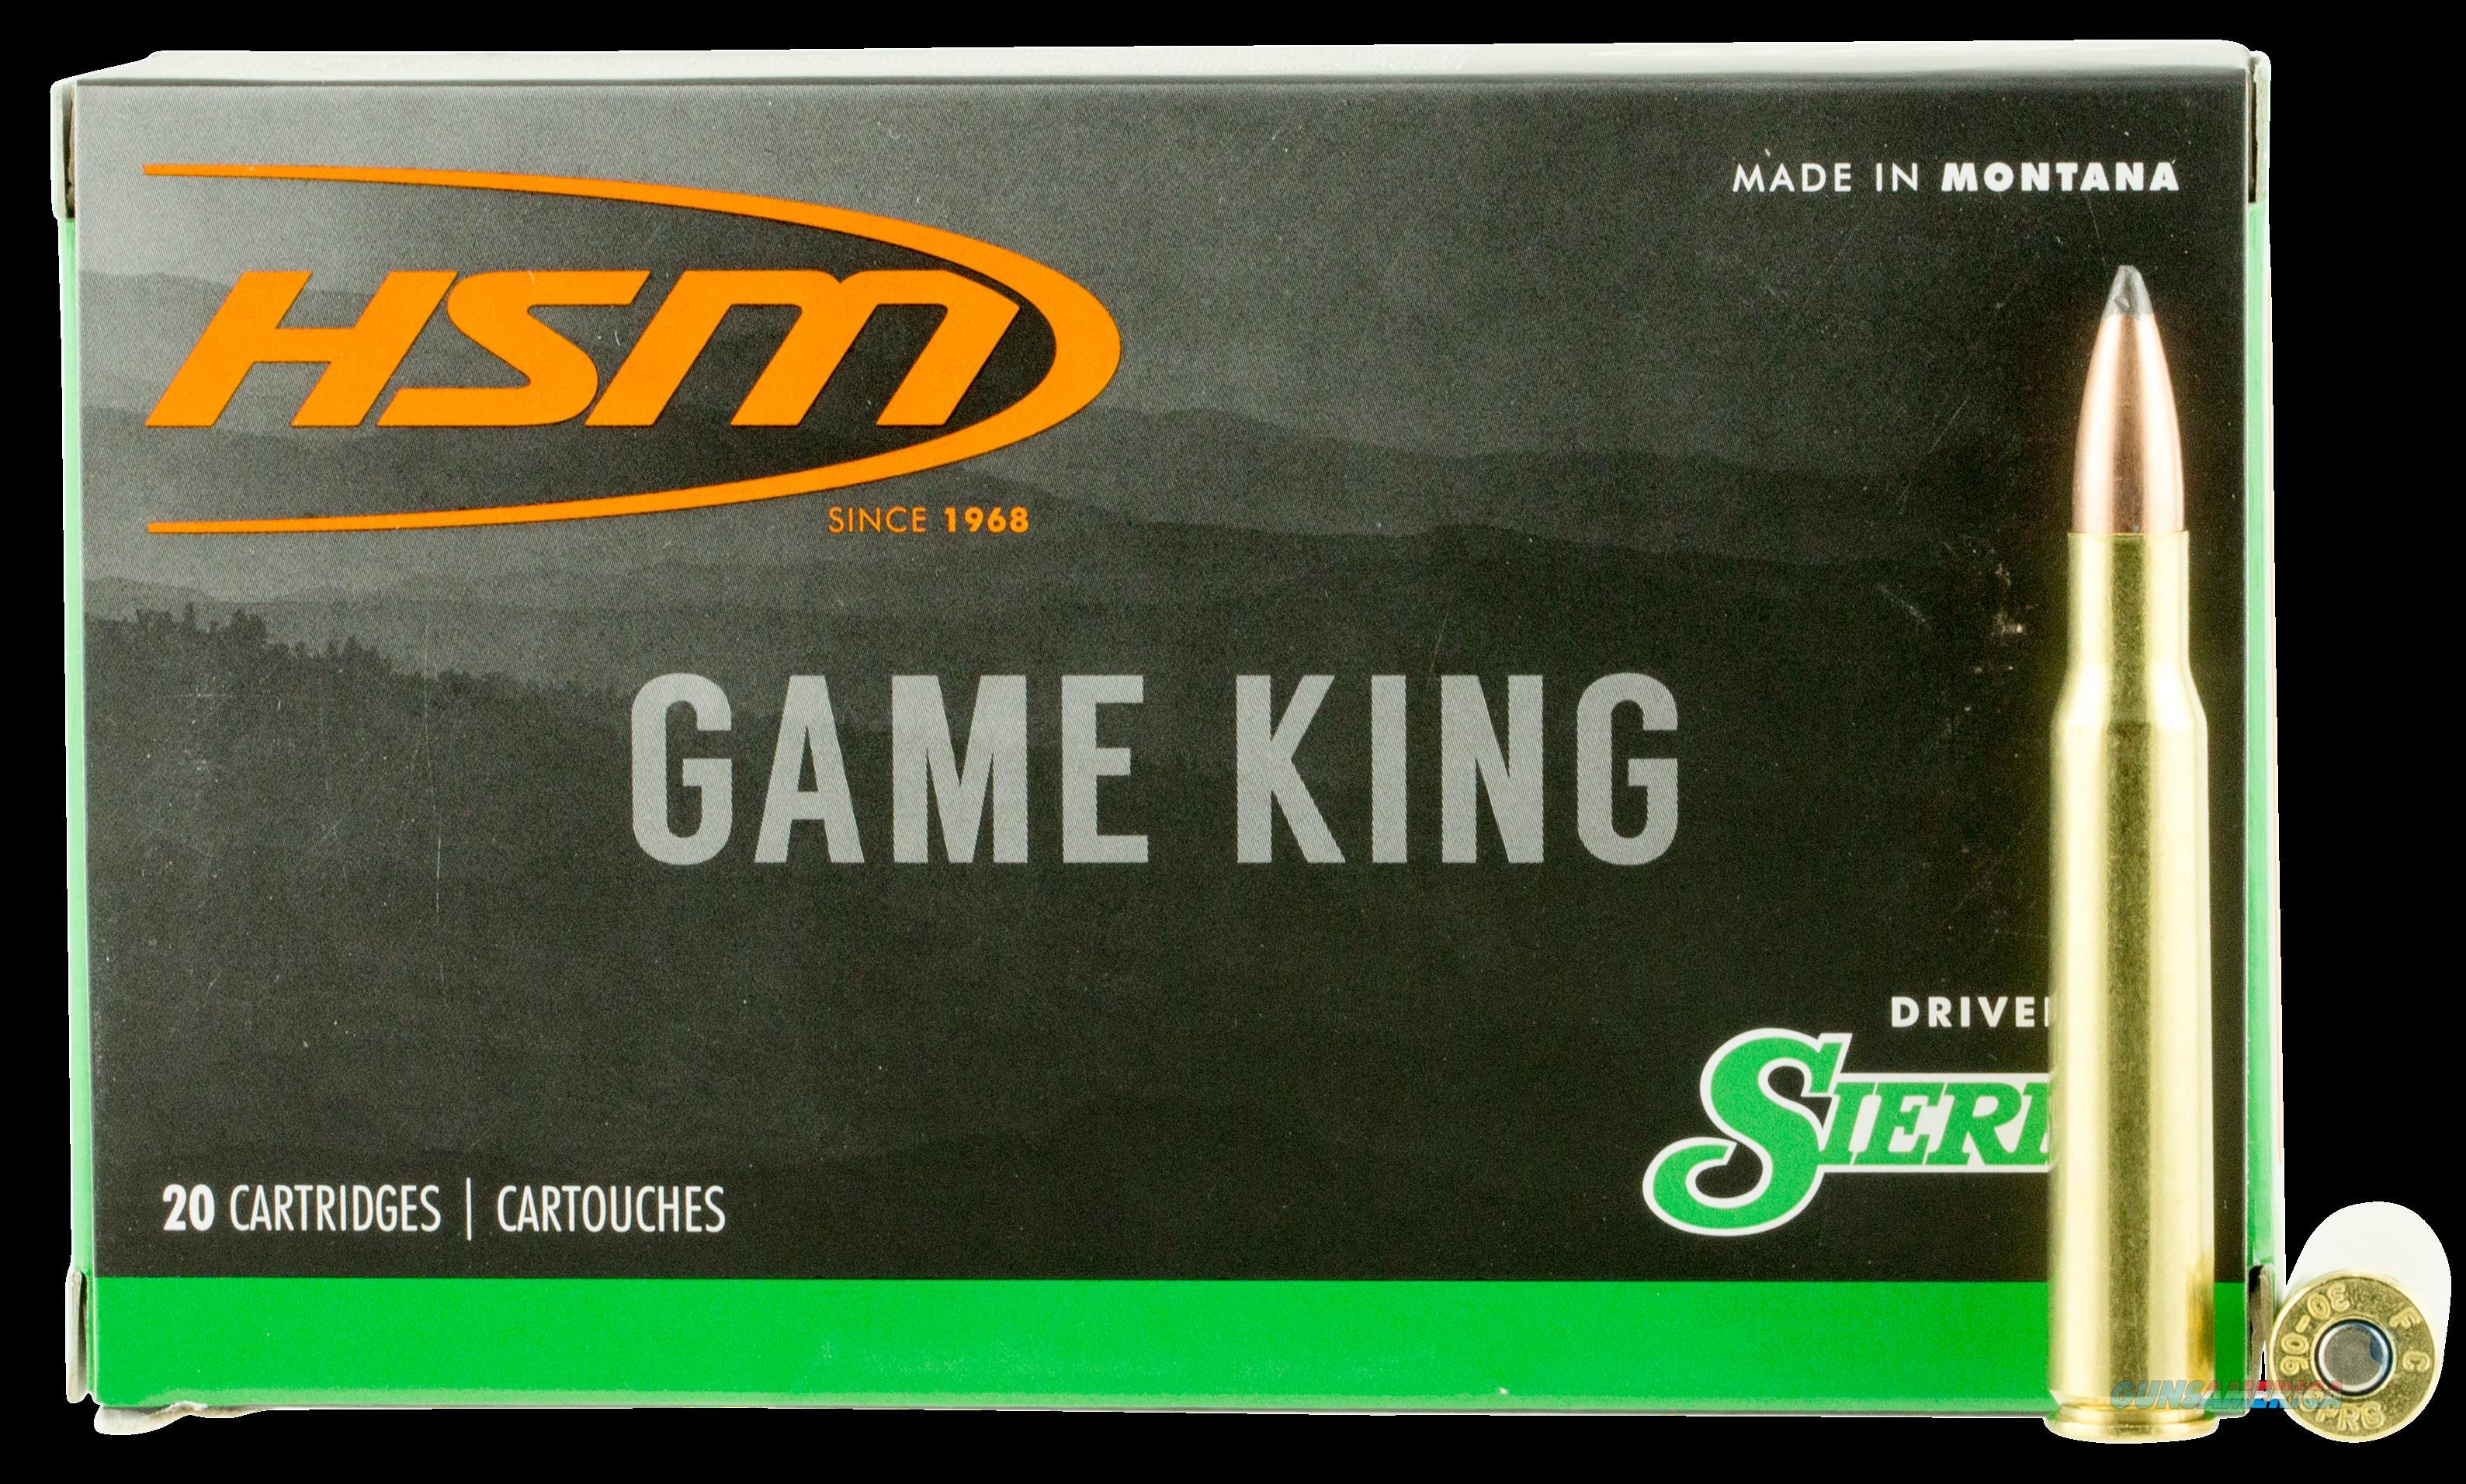 Hsm Game King, Hsm 7mau5n             7x57   160 Sbt  Gk    20-20  Guns > Pistols > 1911 Pistol Copies (non-Colt)